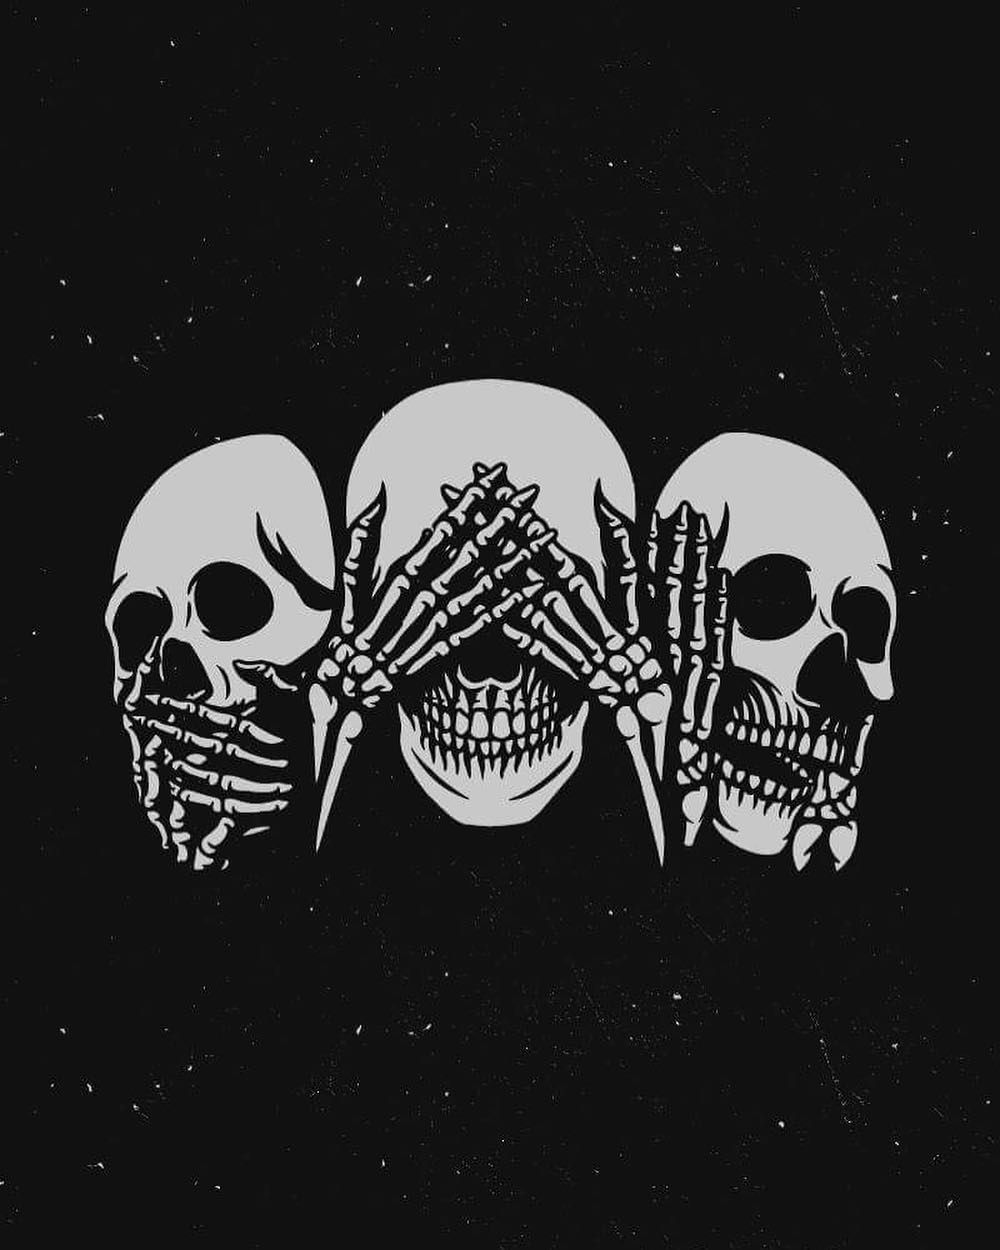 See No Evil Hear No Evil Speak No Evil Dominik Salmic Dominiksalmic On Instagram See No Evil Hear No Evil Speak No Evil Design For Sale Th Skull Wallpaper Skeleton Drawings Evil Skull Tattoo